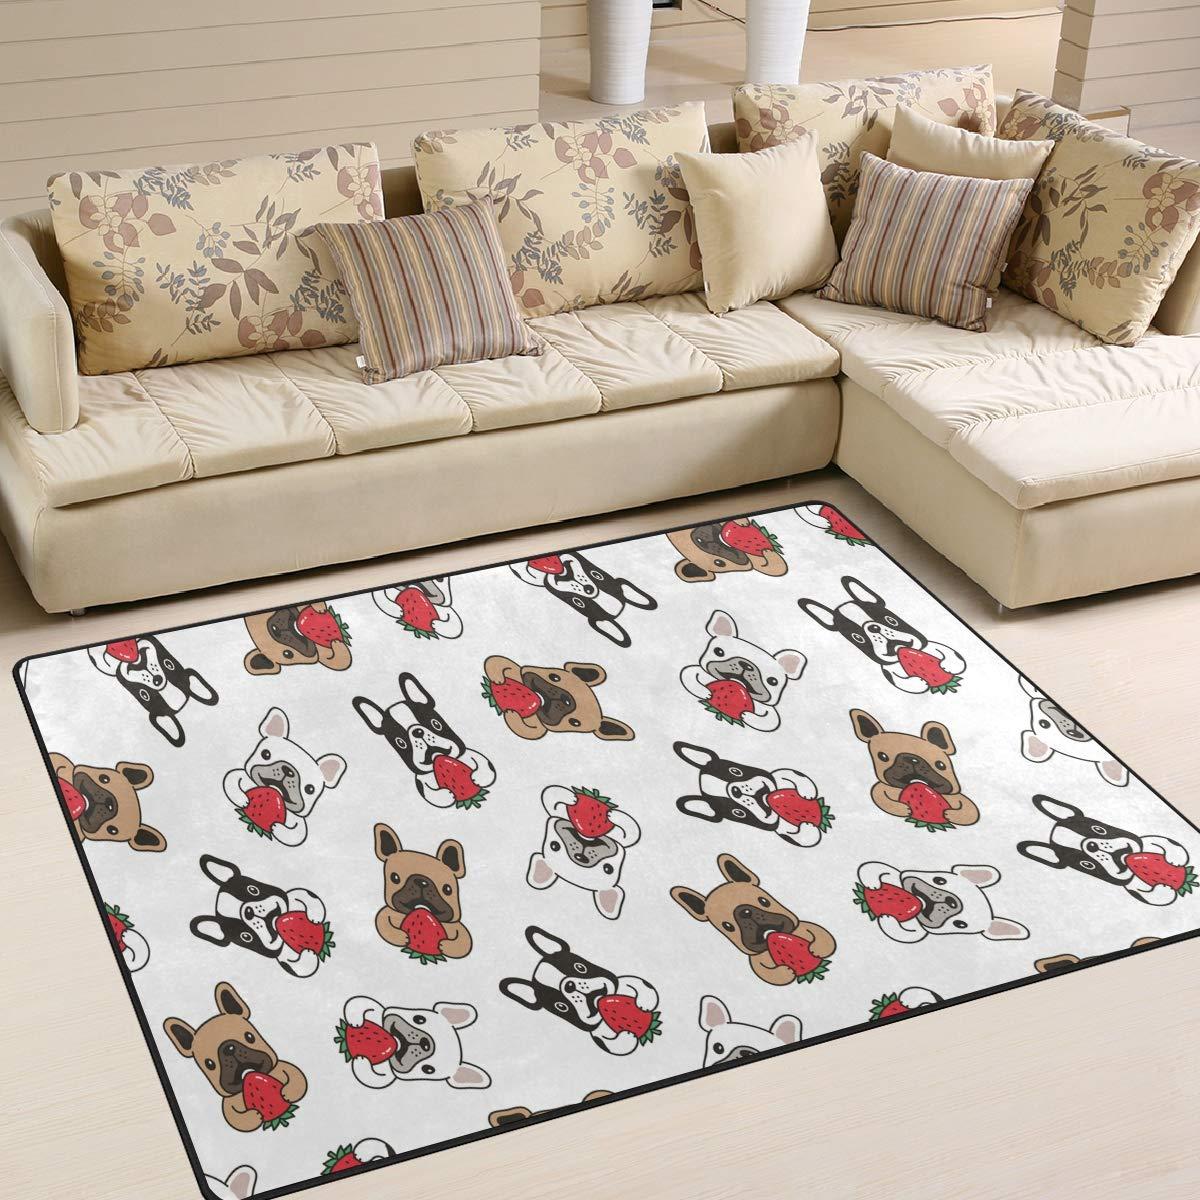 ALAZA Home Decoration Dog French Bulldog Strawberry Cartoon Large Rug Floor Carpet Yoga Mat, Modern Area Rug for Children Kid Playroom Bedroom, 5' x 7'